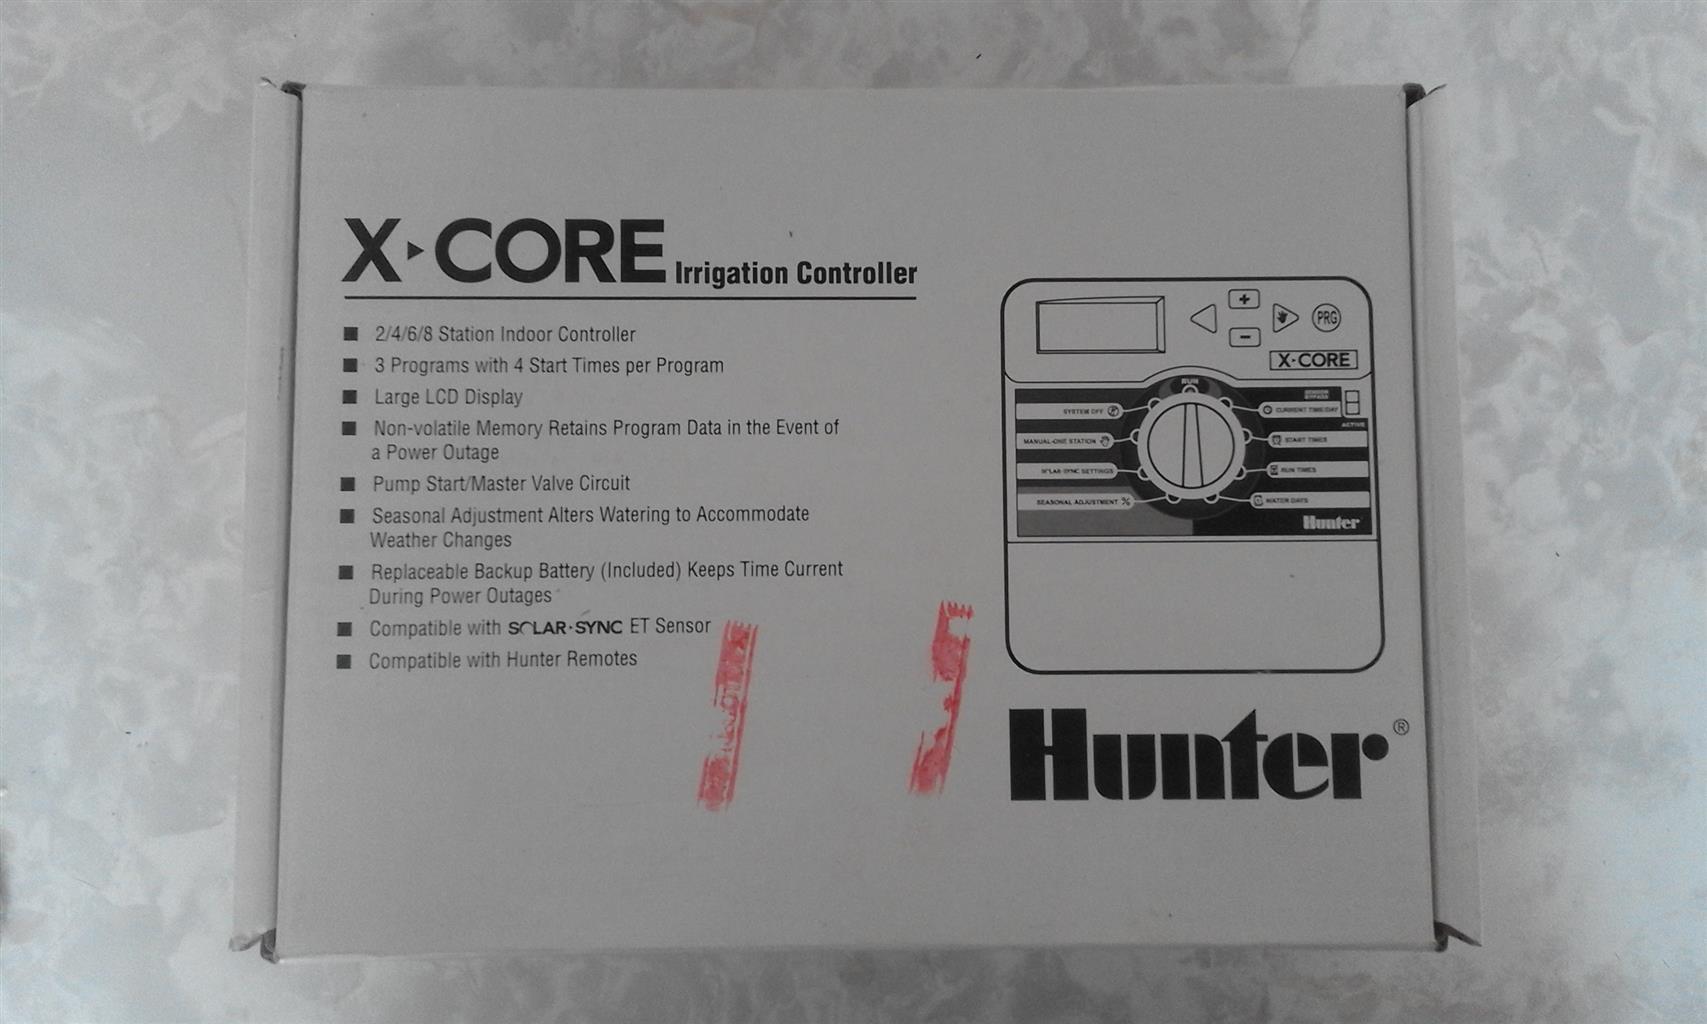 Hunter X-Core Irrigation Conroller